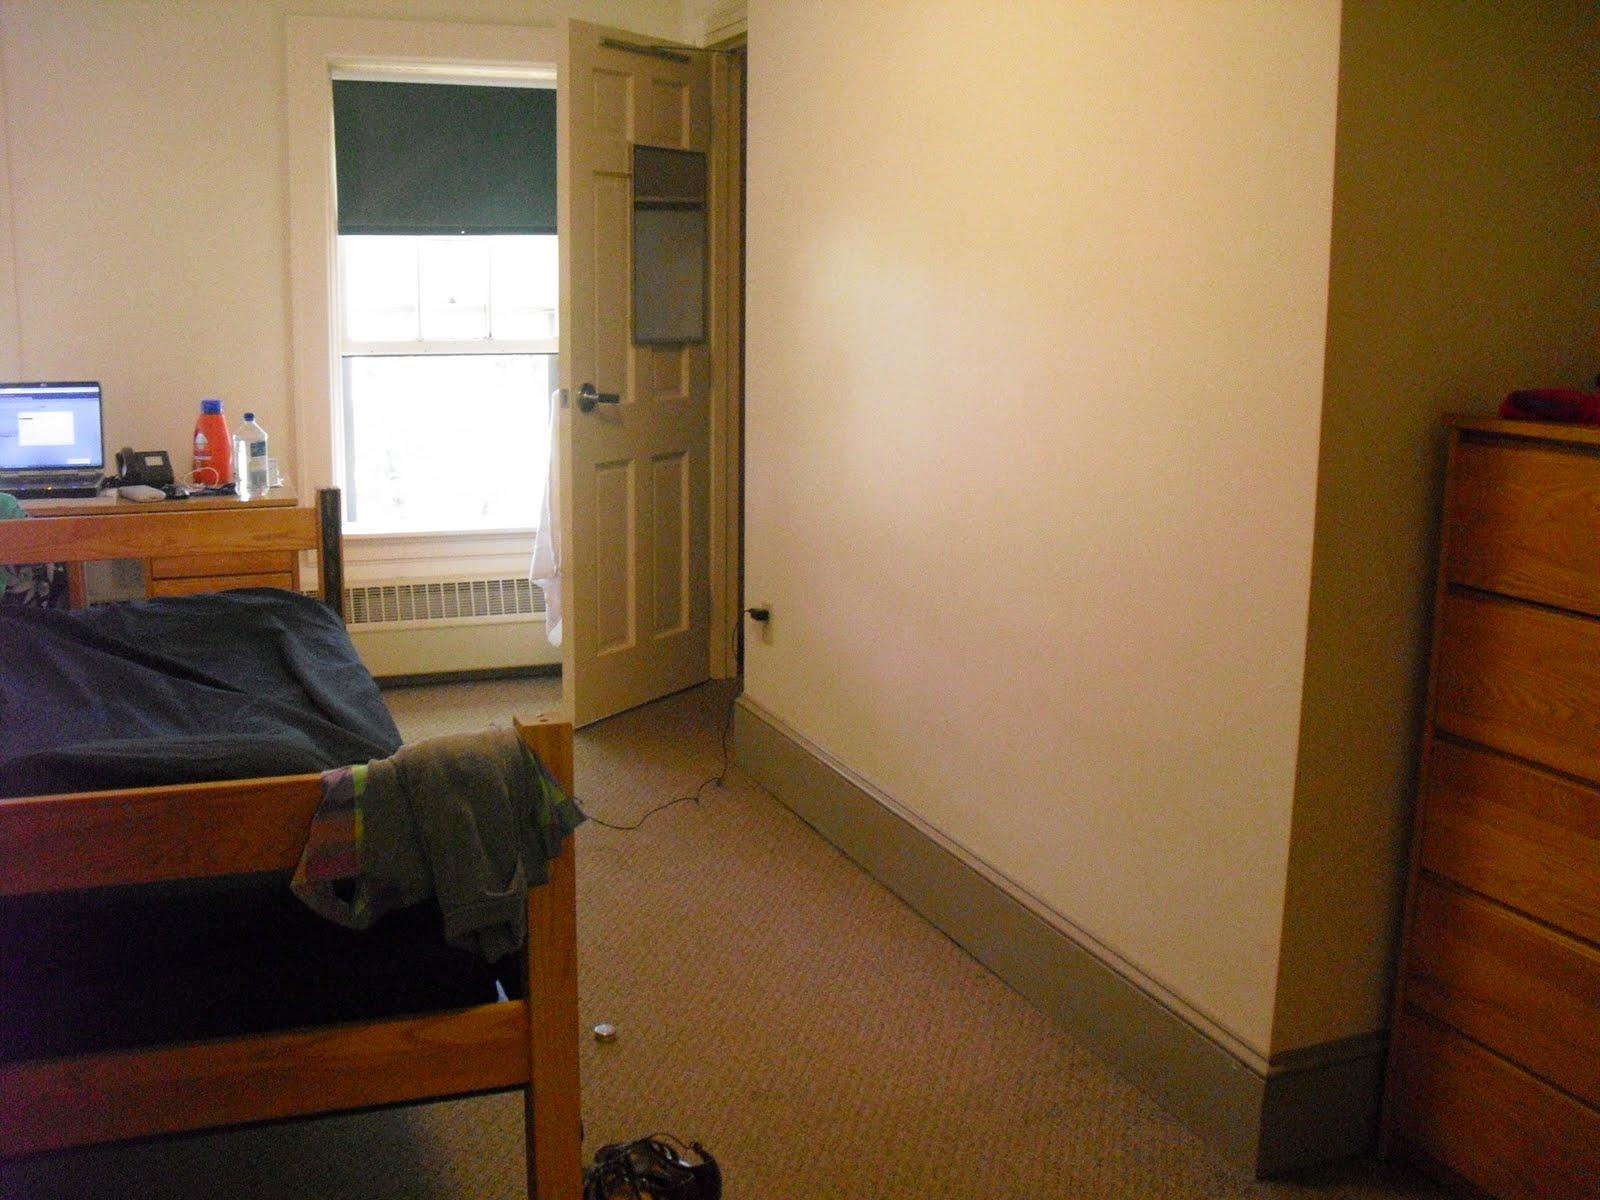 Inside Harvard Freshman Dorms The gallery for -->...